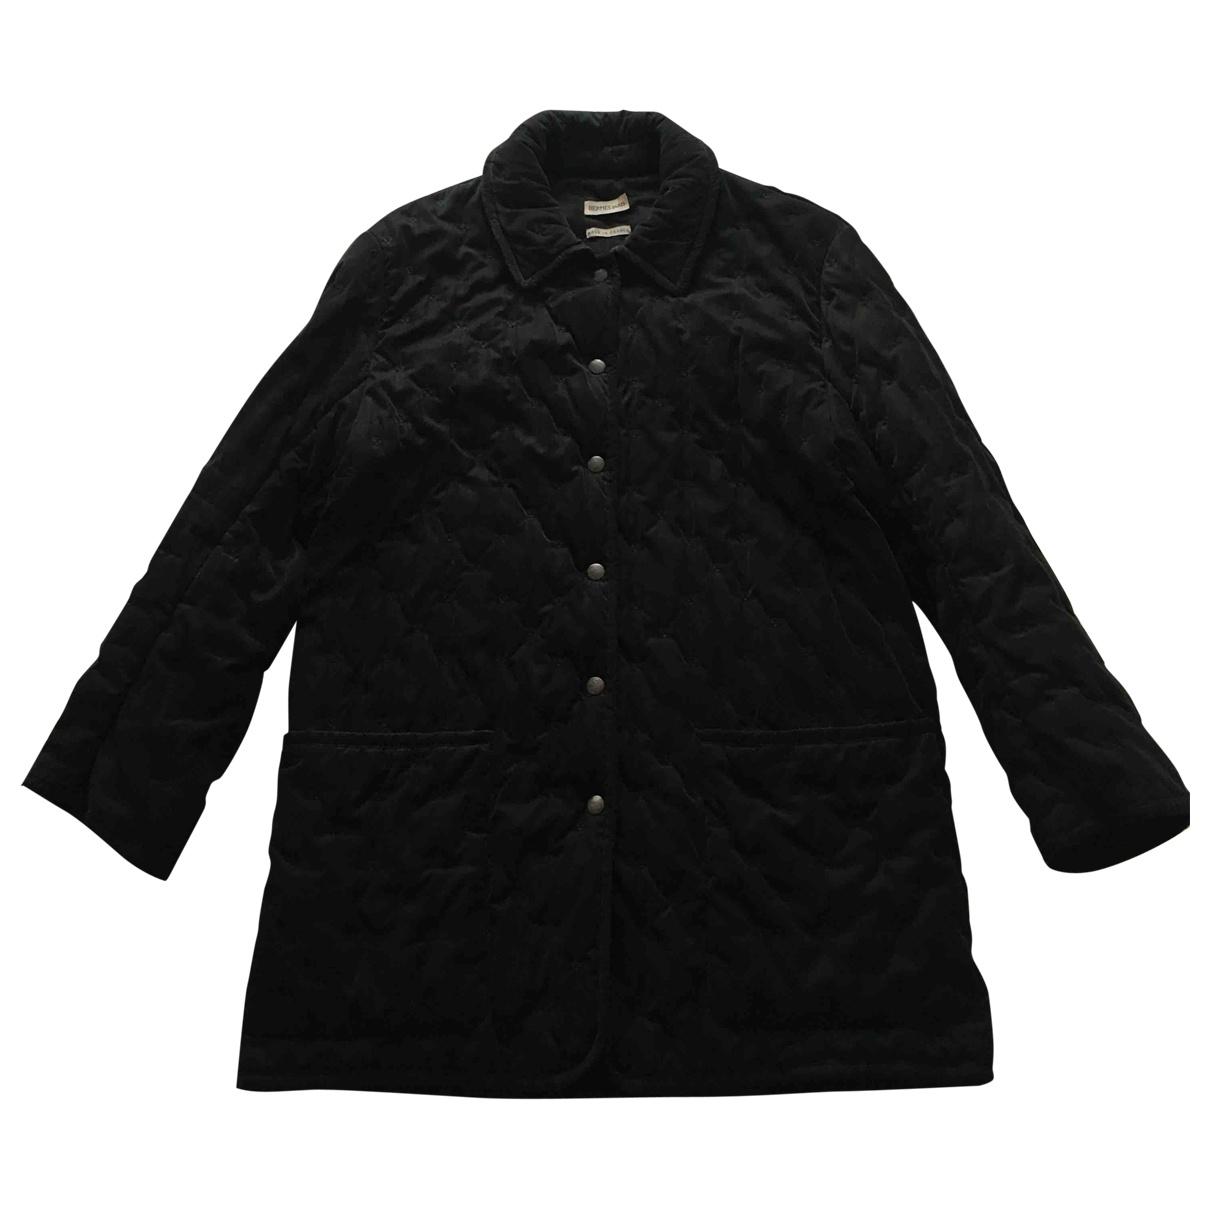 Hermès \N Green jacket for Women 36 FR